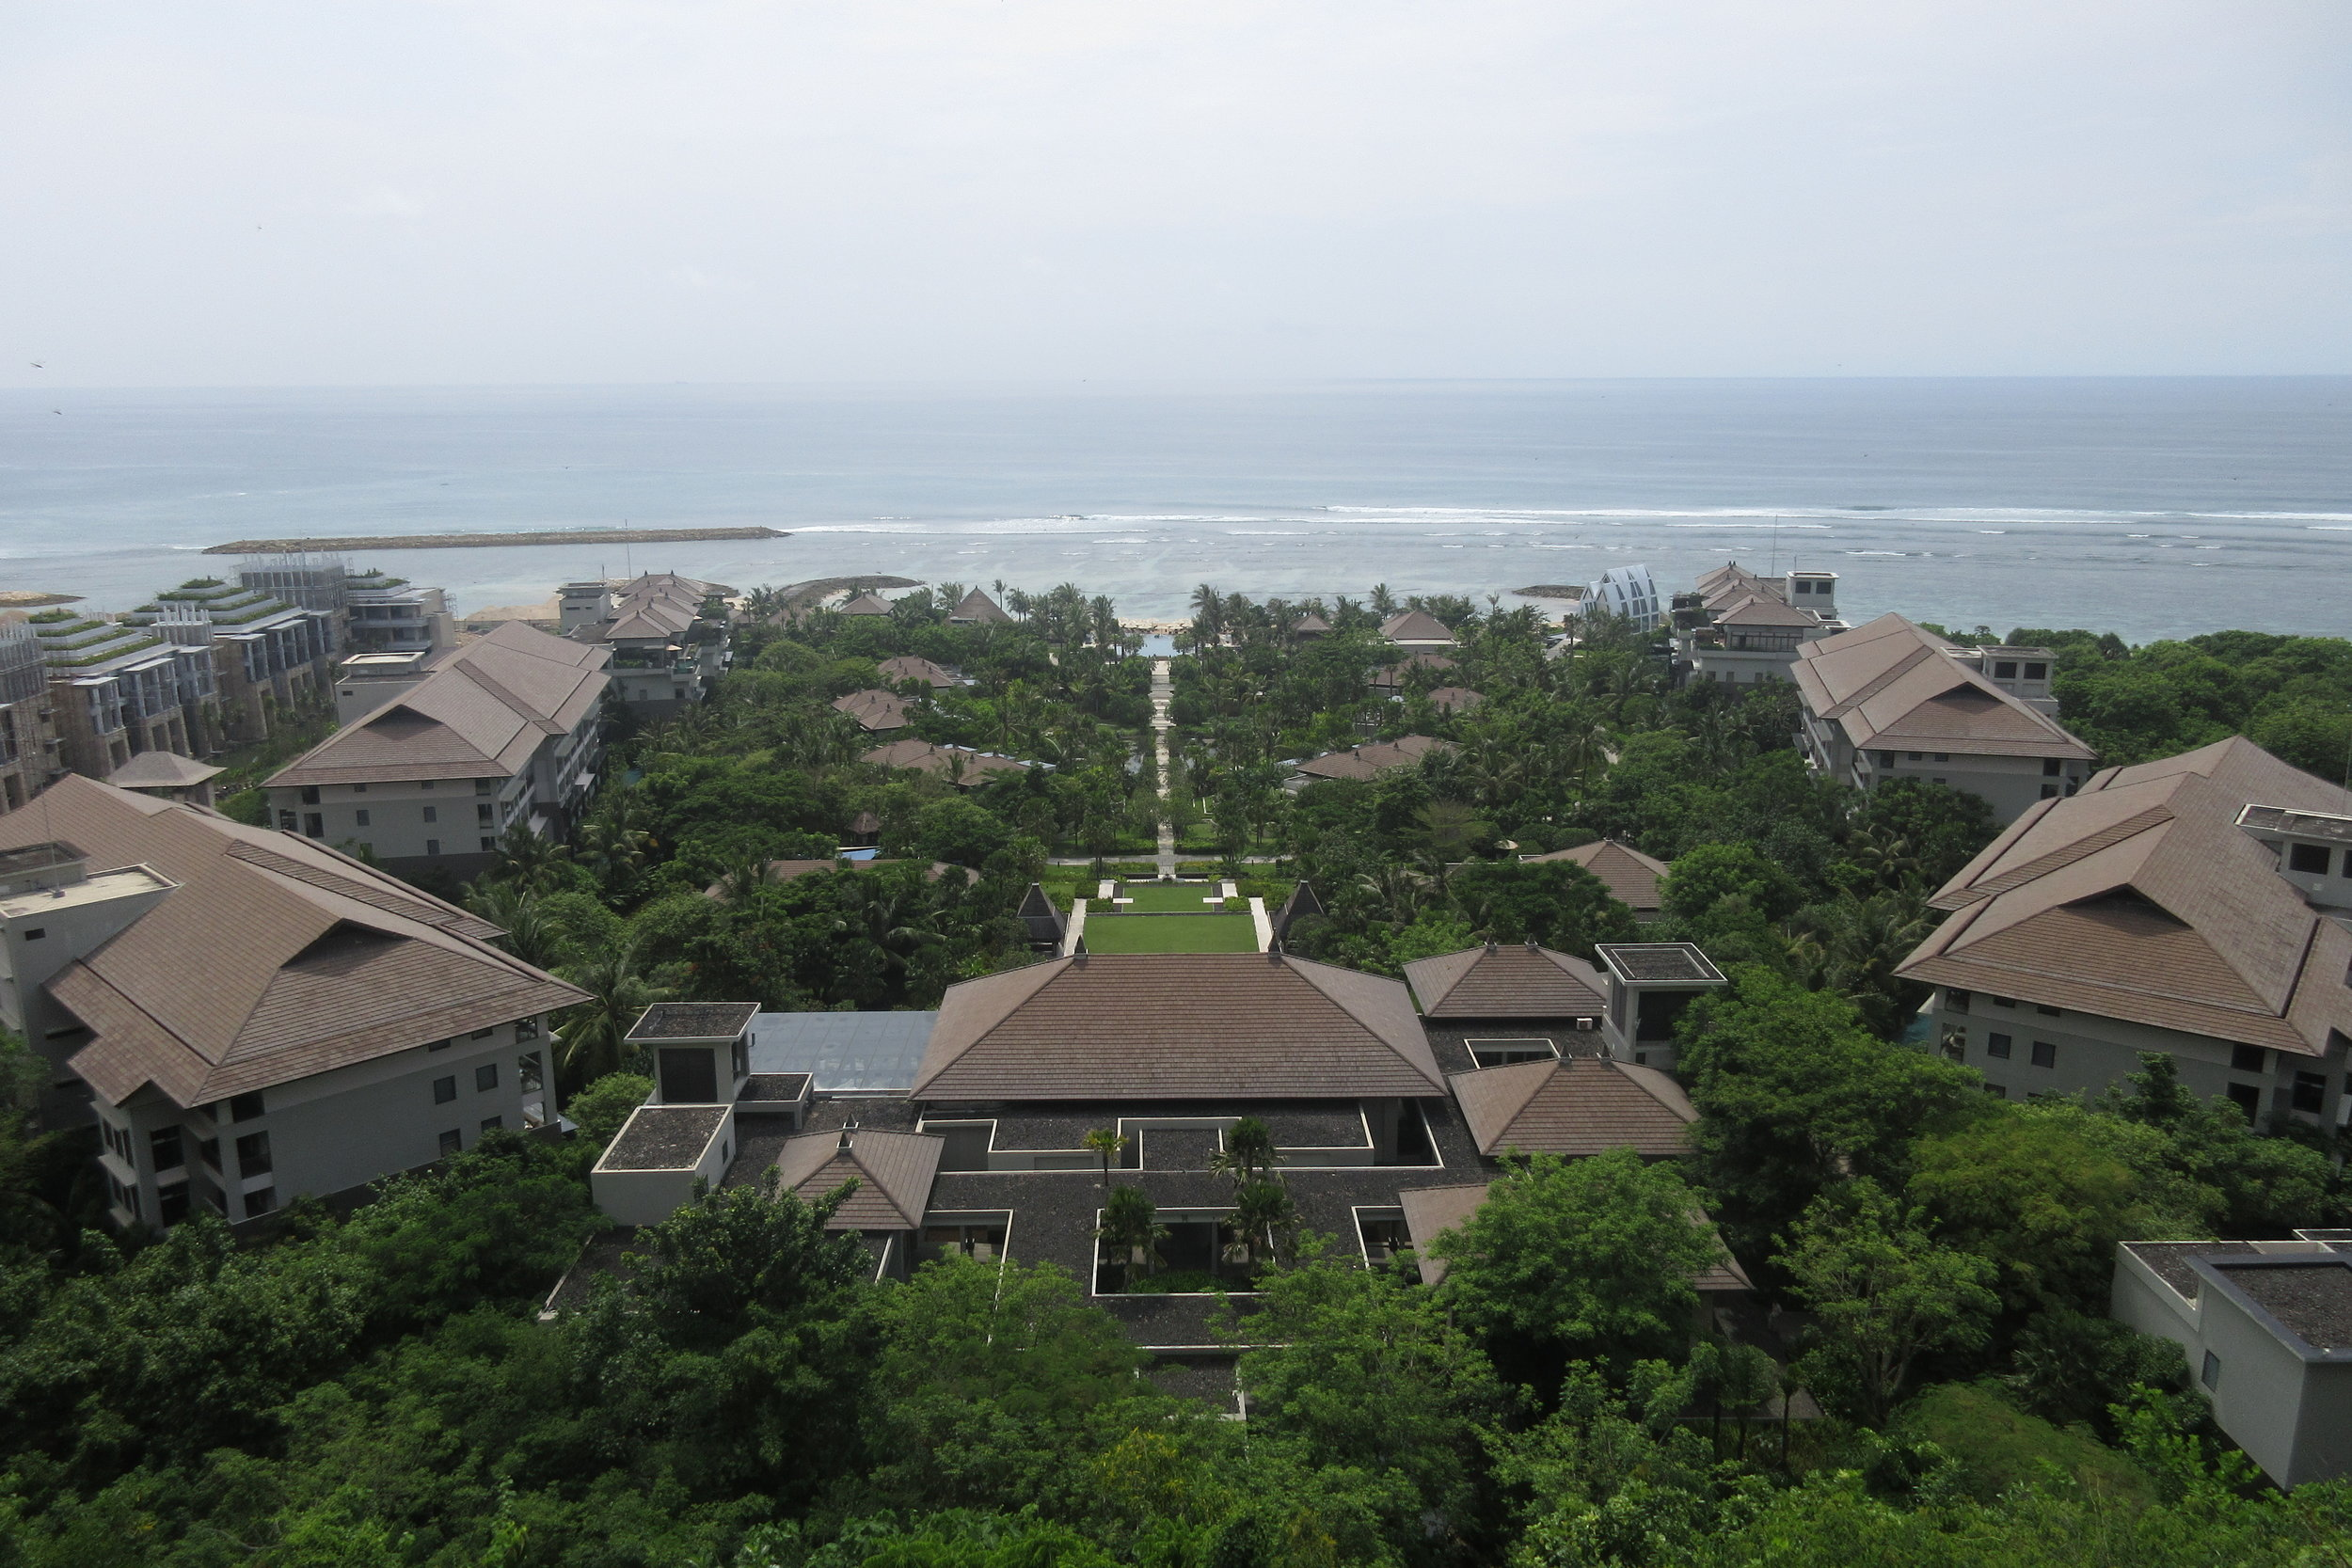 The Ritz-Carlton, Bali – Views from the lobby